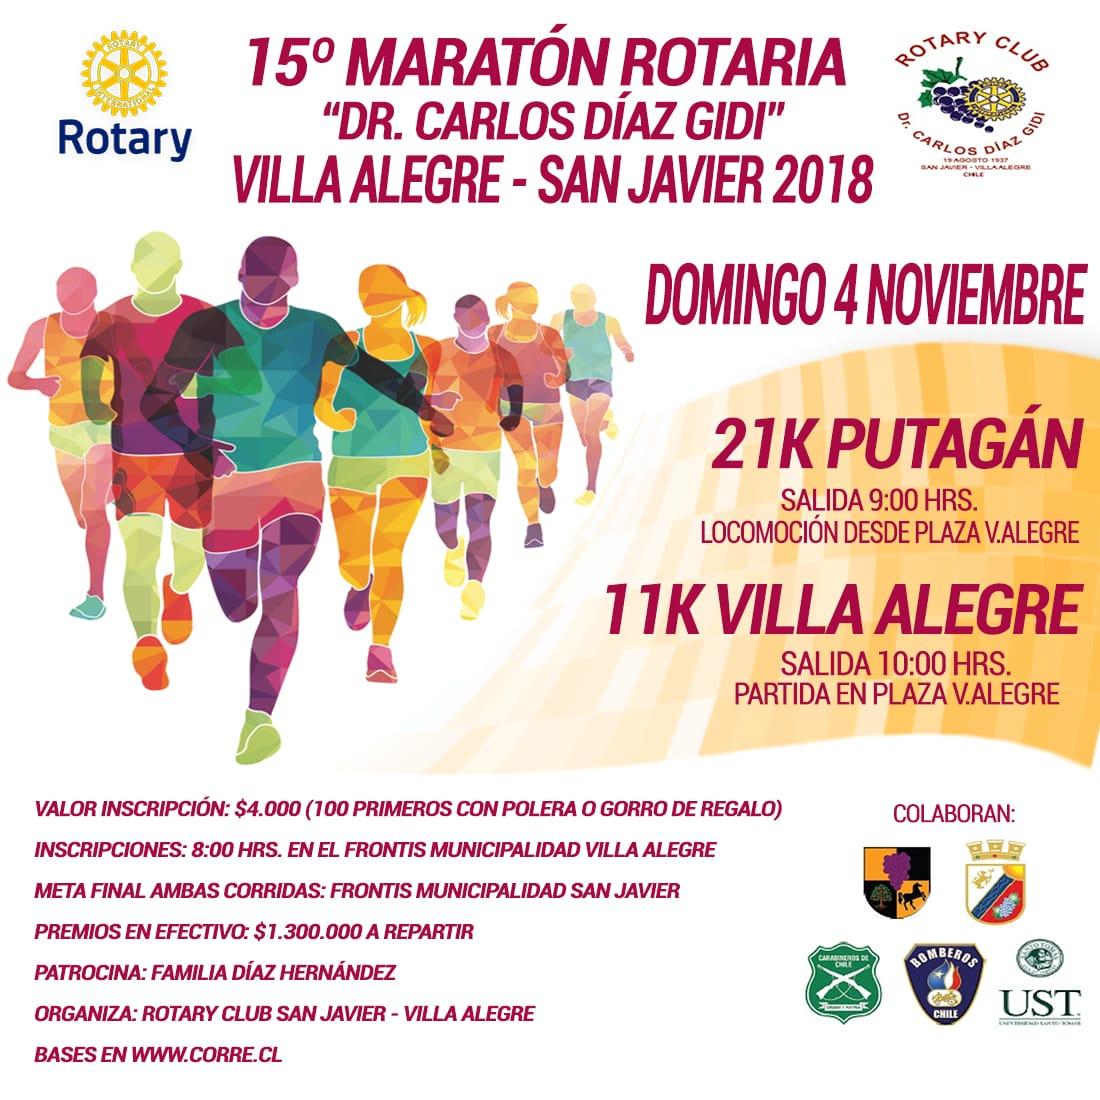 Maratón Rotaria Dr. Carlos Díaz Gidi - Villa Alegre